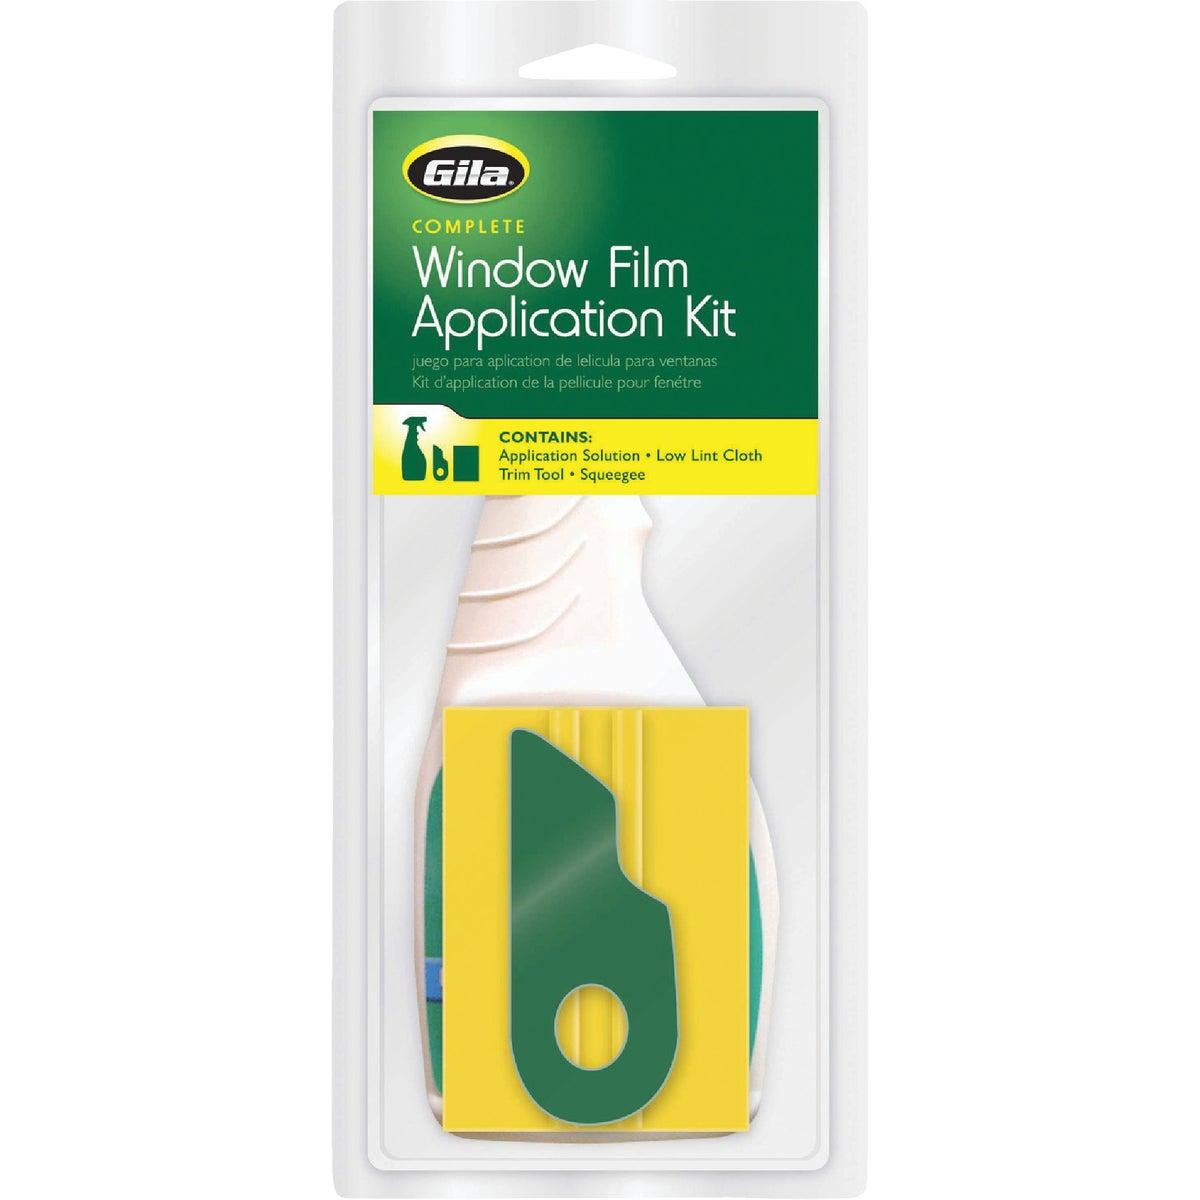 Window Film App Kit